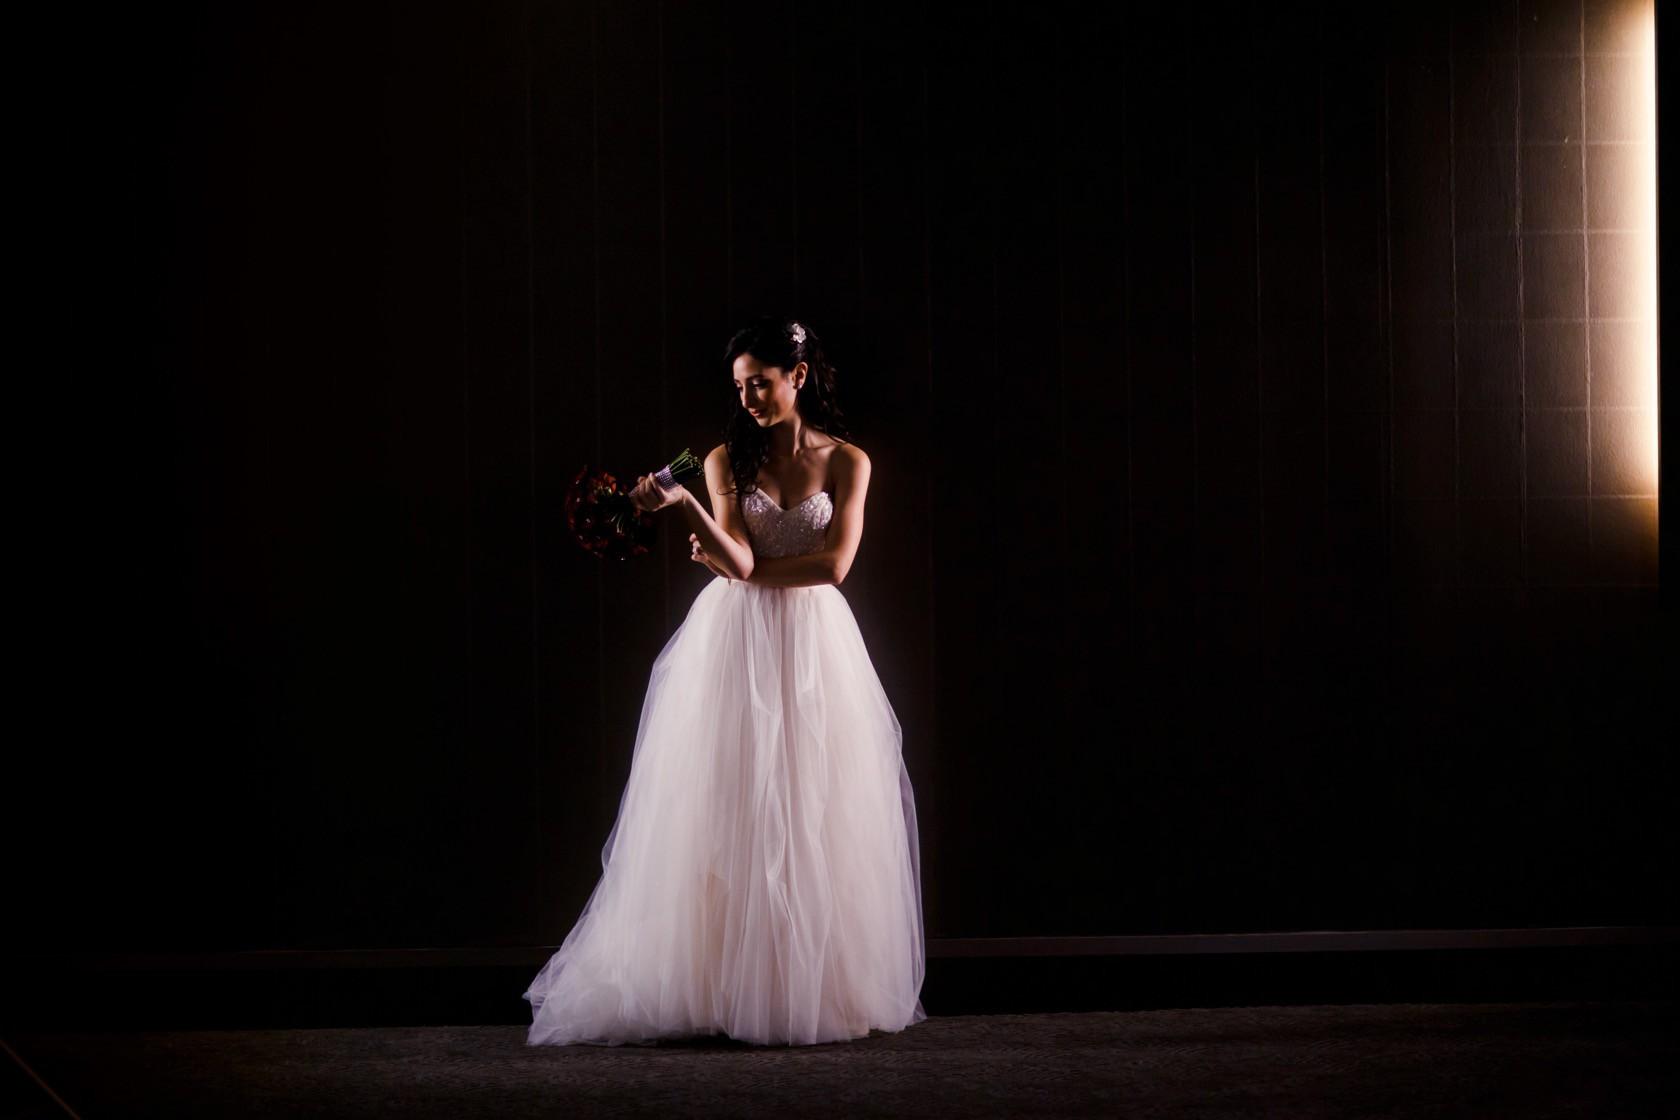 stephen sager photography 0077 fine art wedding photography